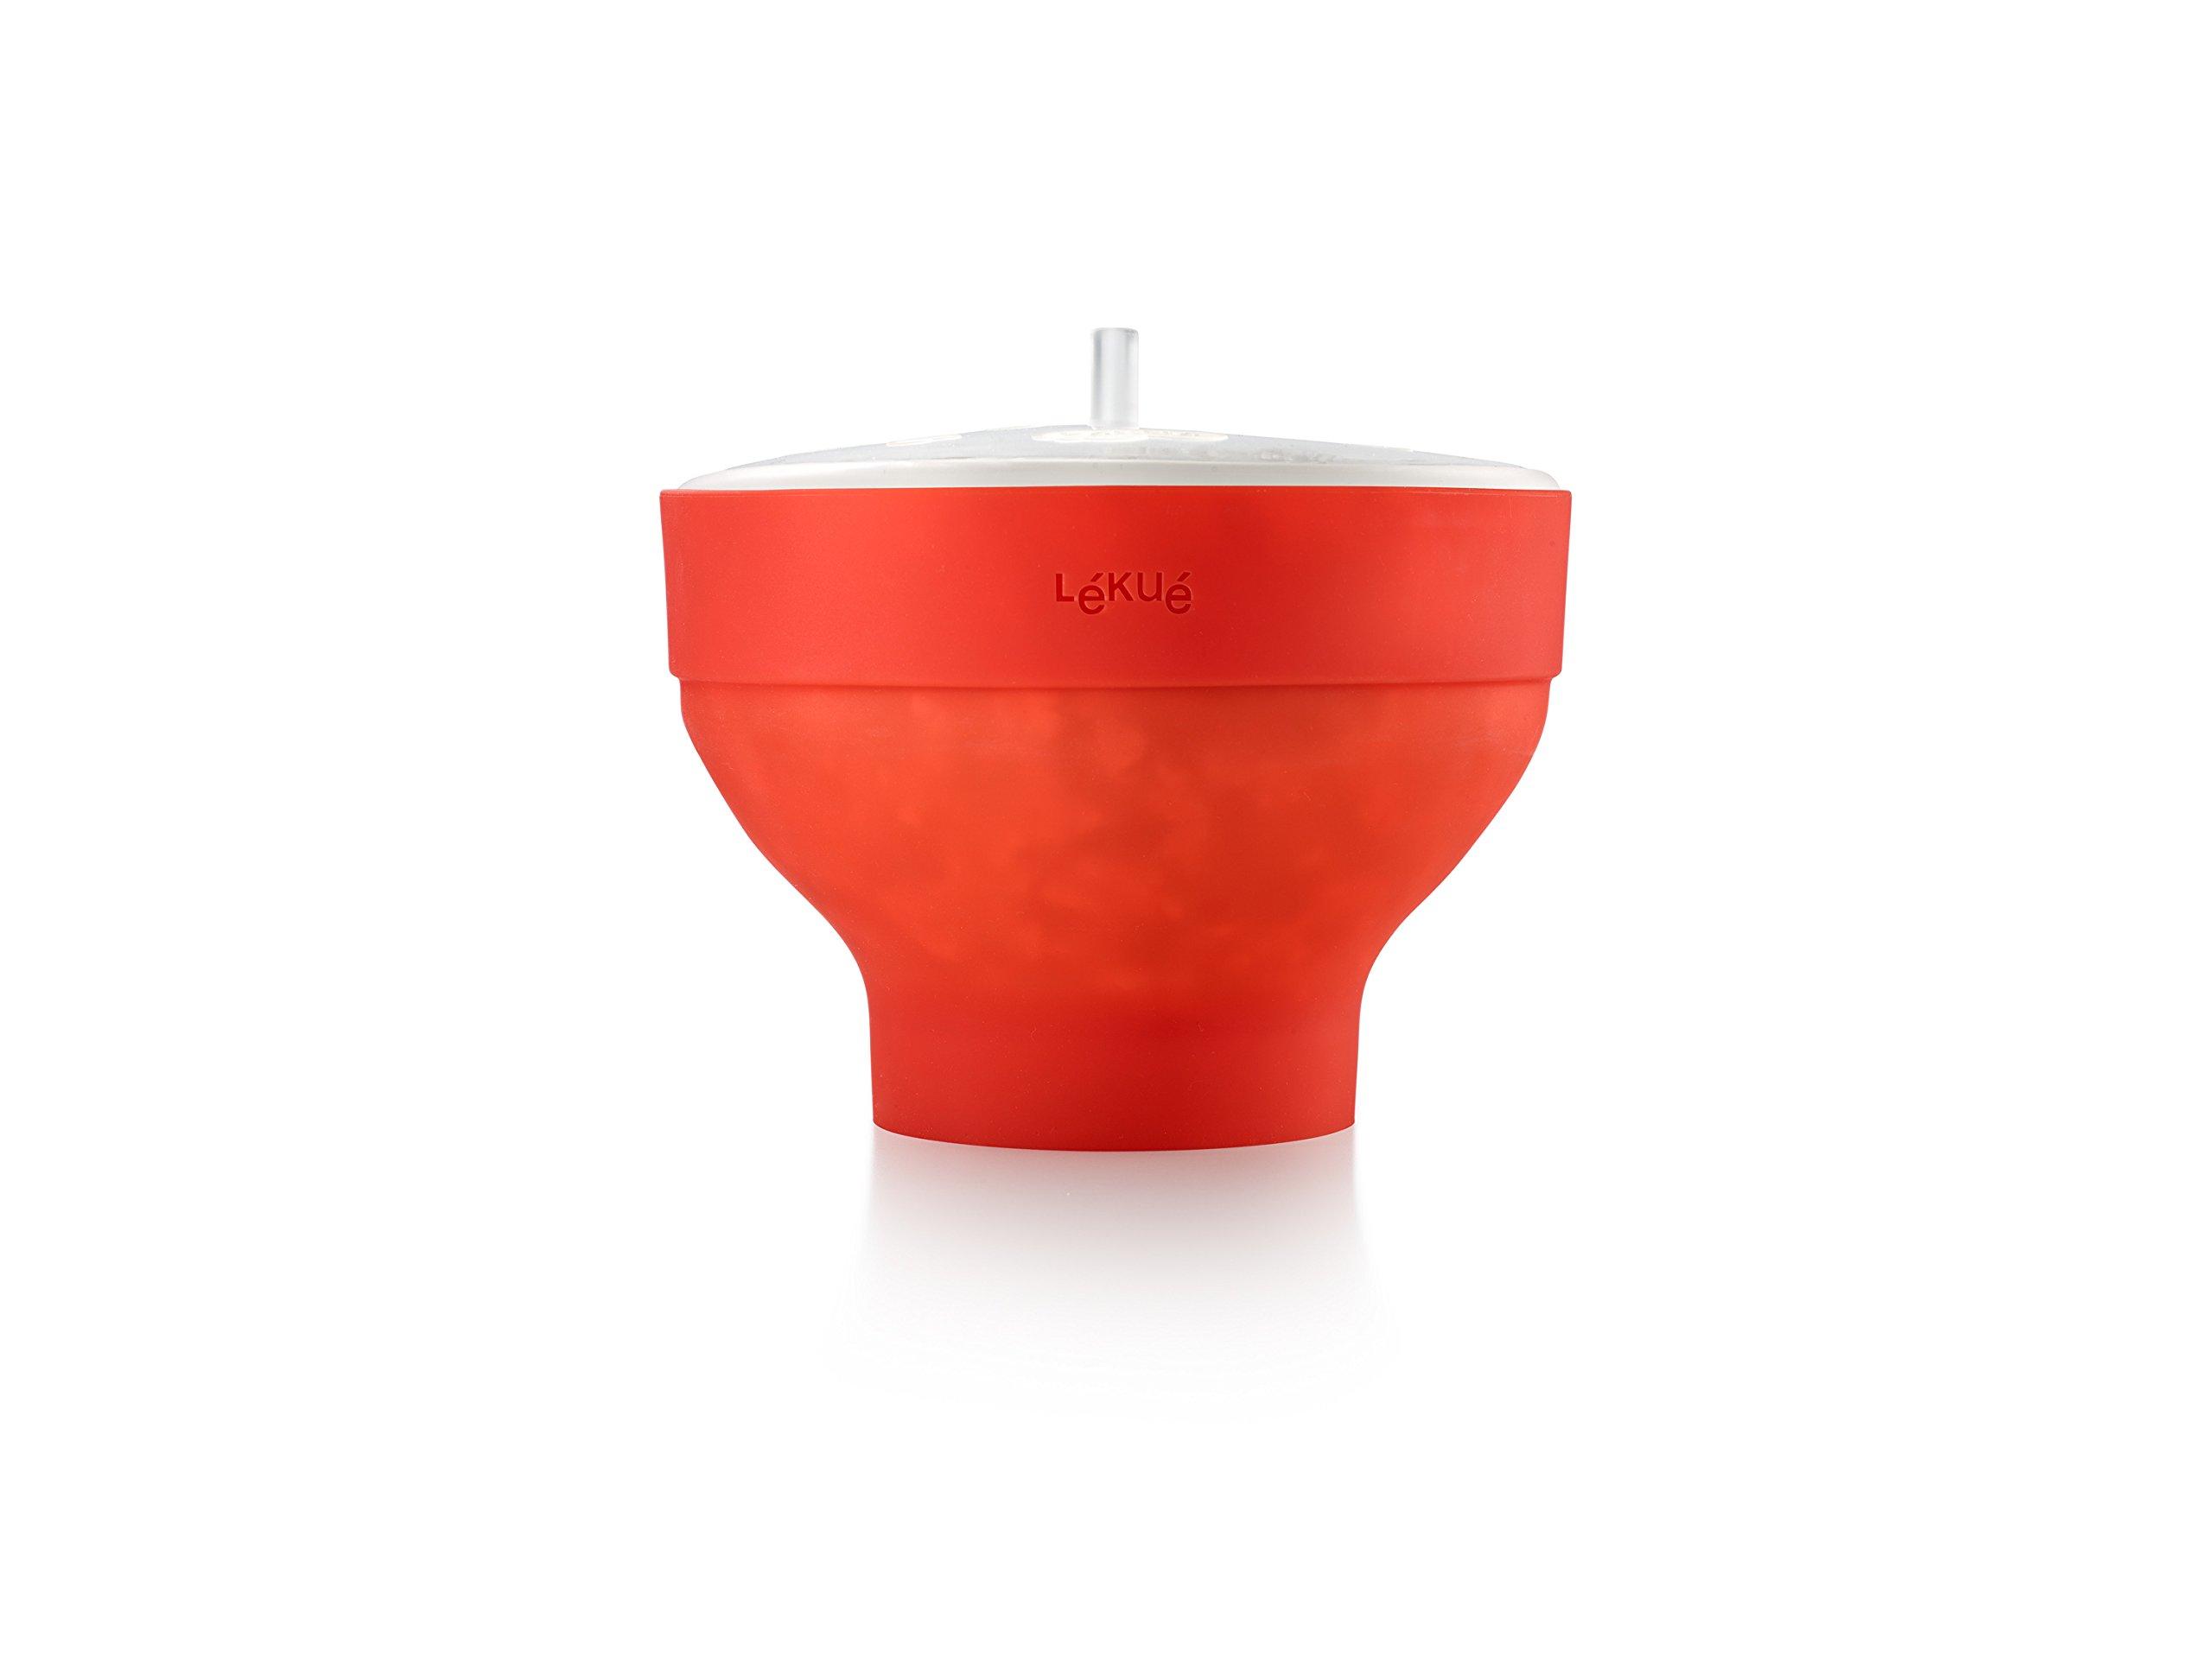 Lékué Recipiente para cocinar Palomitas, Silicona, Rojo, 20 cm